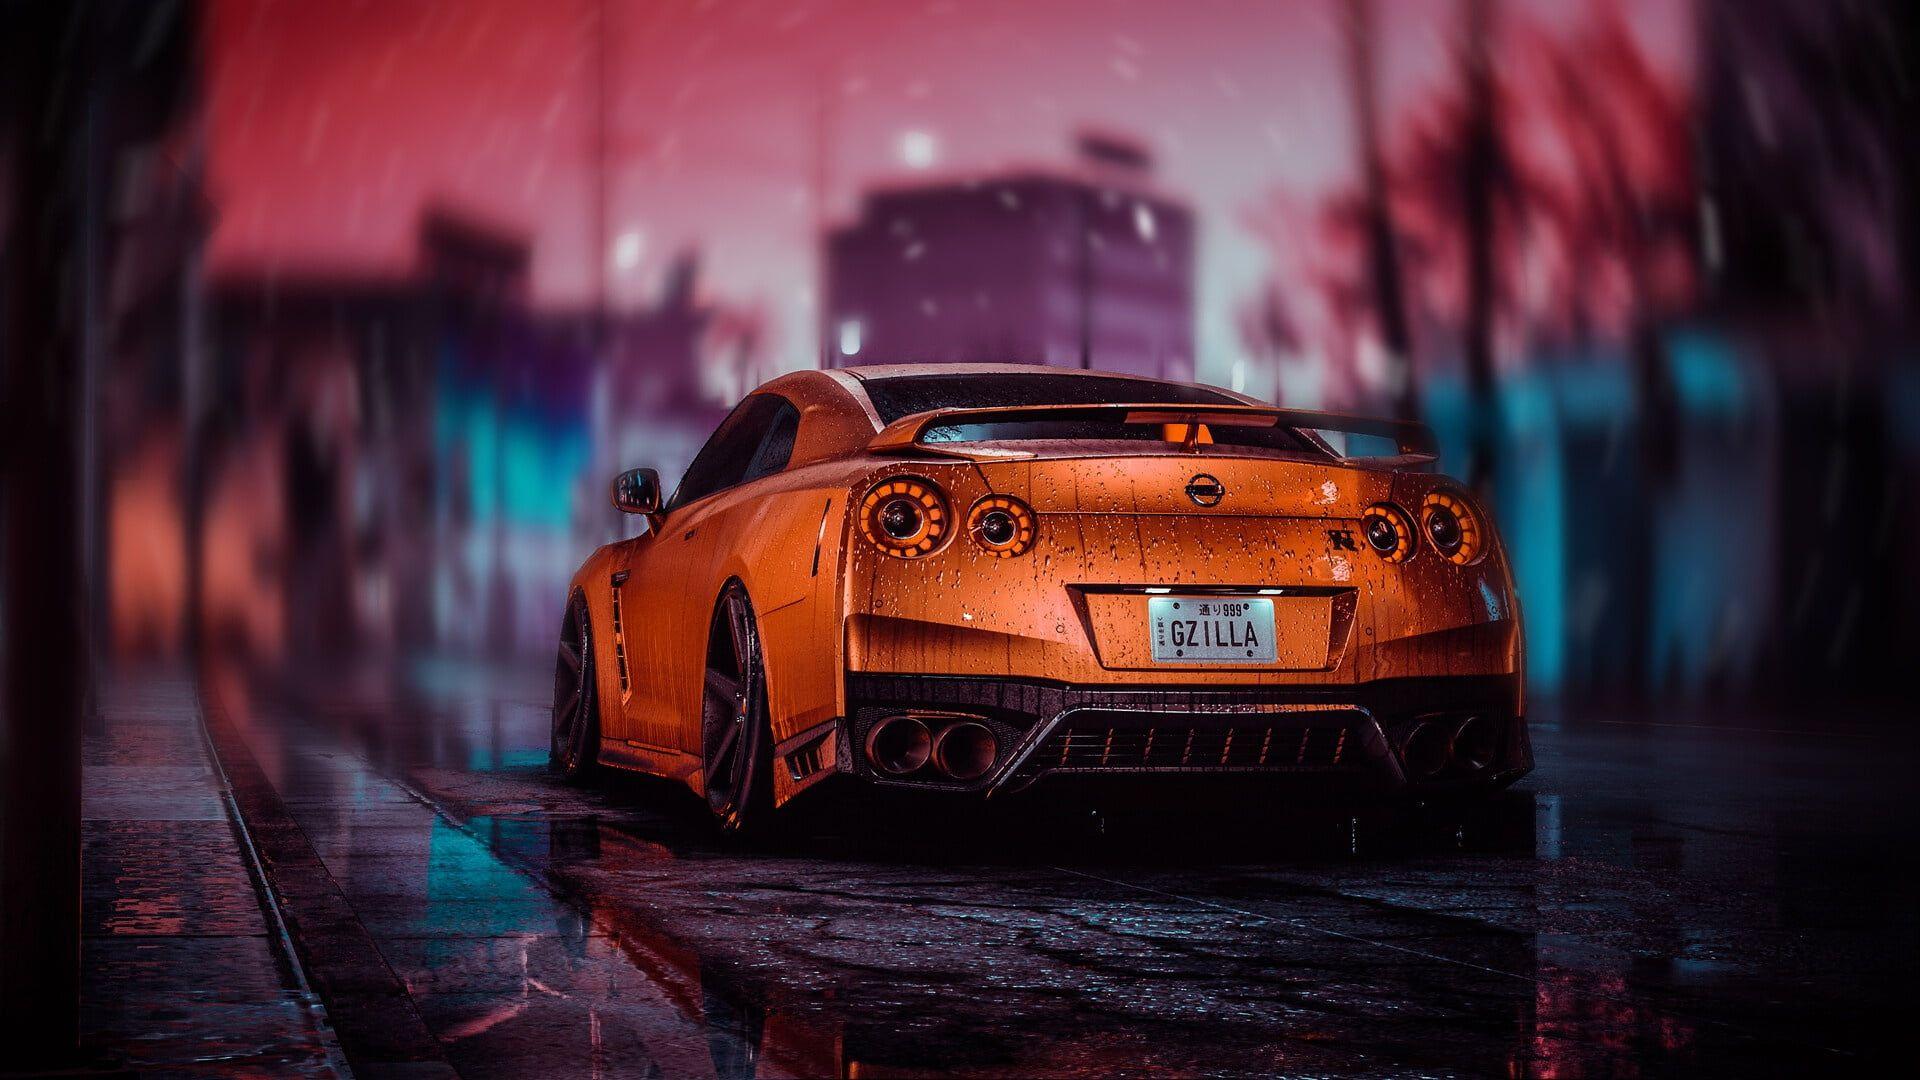 Orange Cars Digital Art Car Nissan Nissan Gt R Vehicle 1080p Wallpaper Hdwallpaper Desktop In 2021 Nissan Gtr Nissan Gt R Nissan Gtr Wallpapers